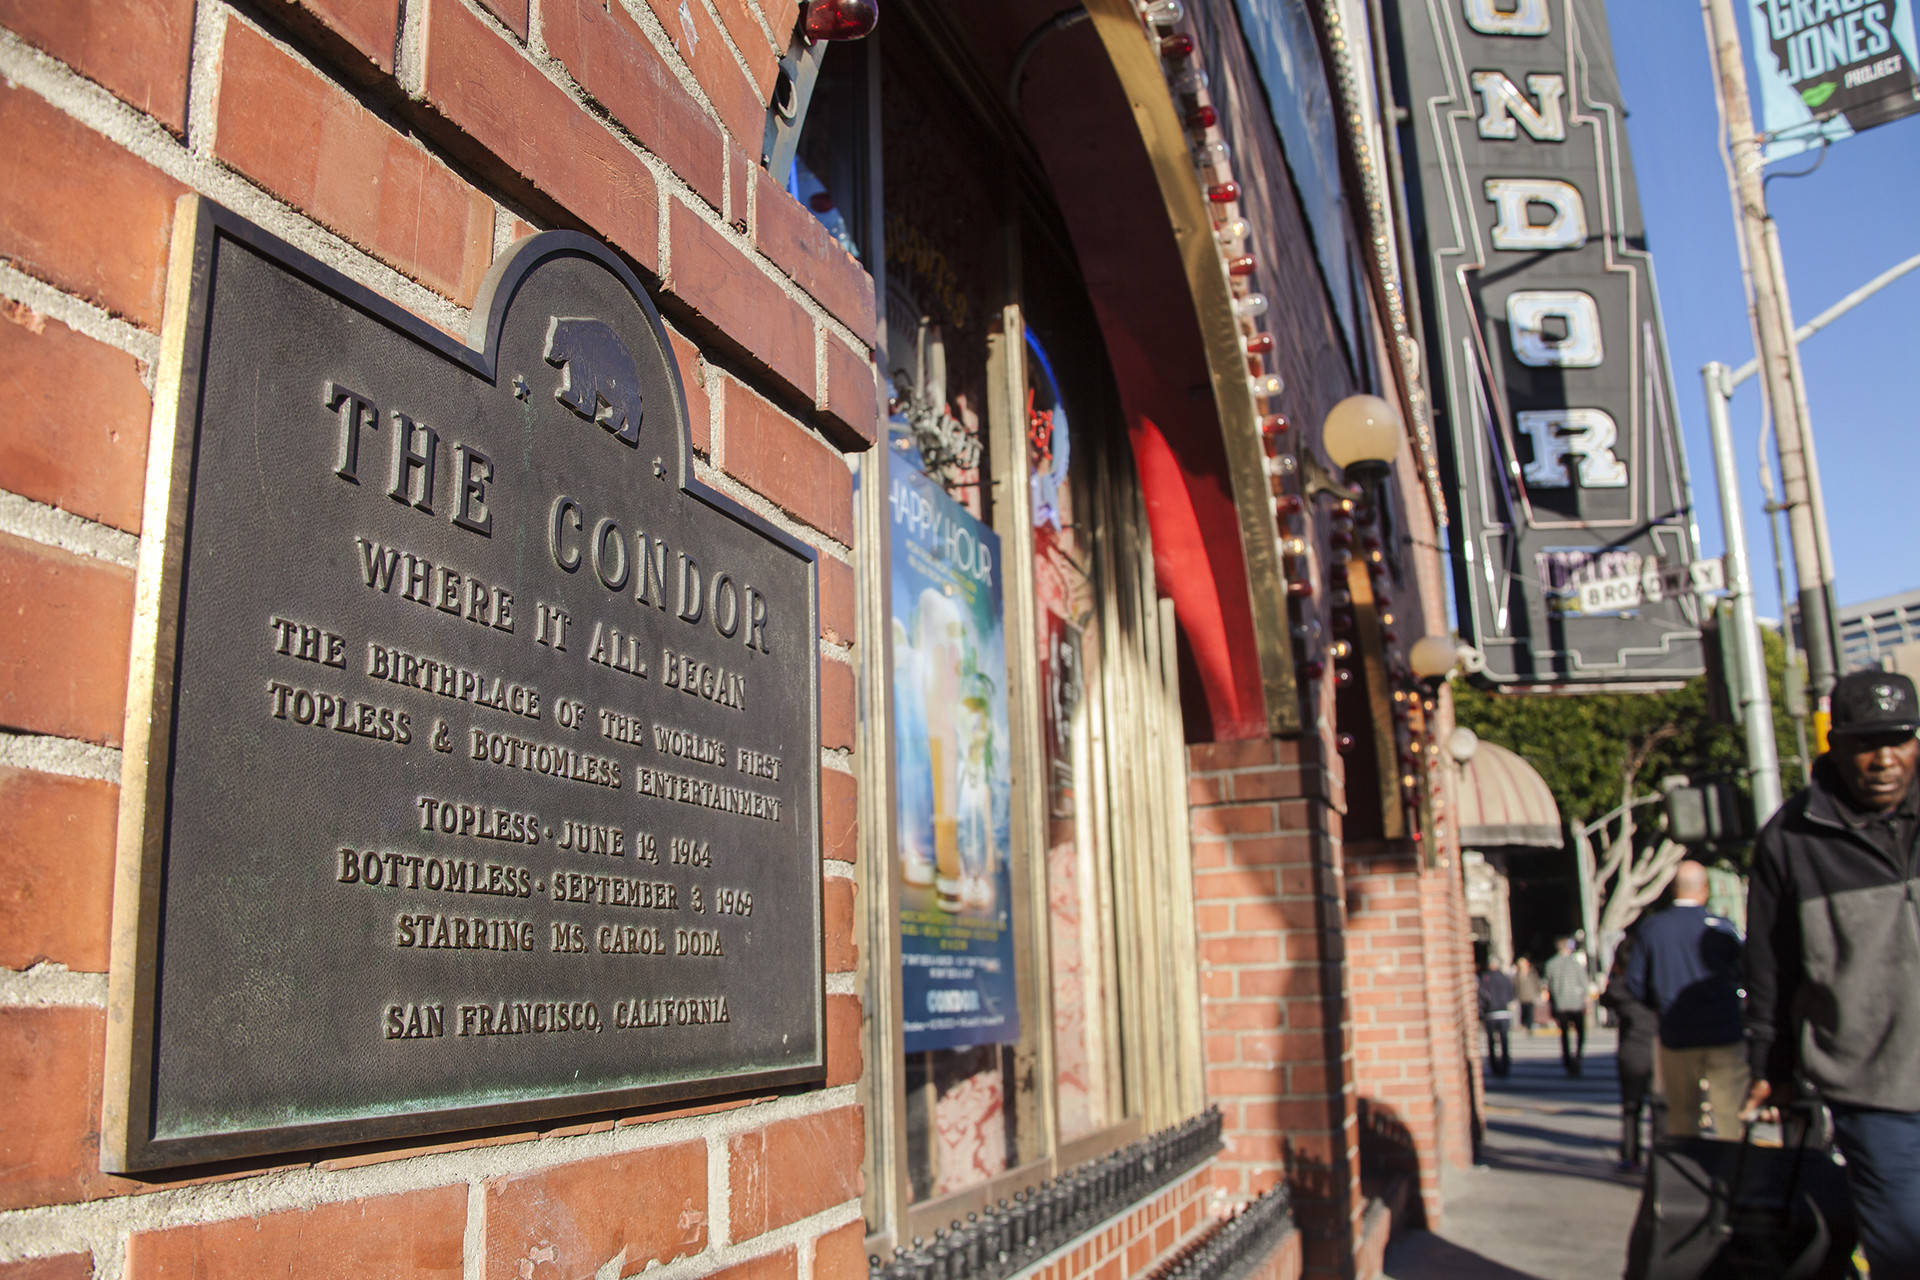 A plaque hangs outside the Condor Club in San Francisco.